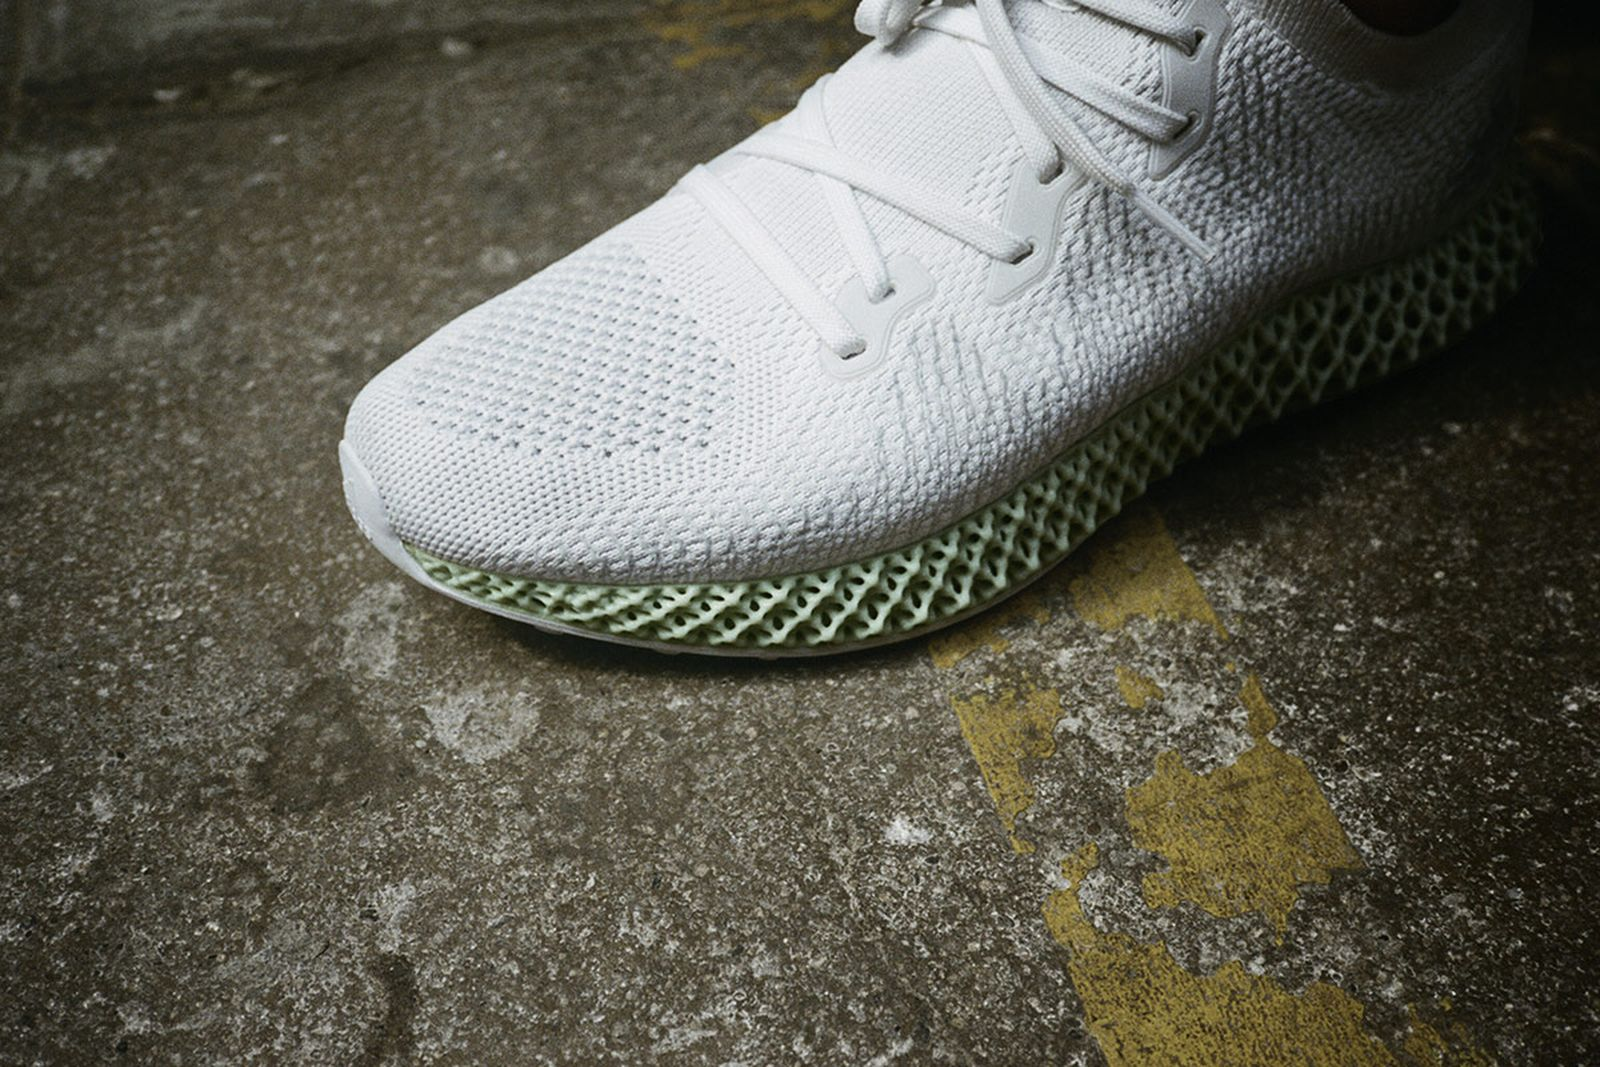 adidas alphaedge 4d white release date price official adidas futurecraft